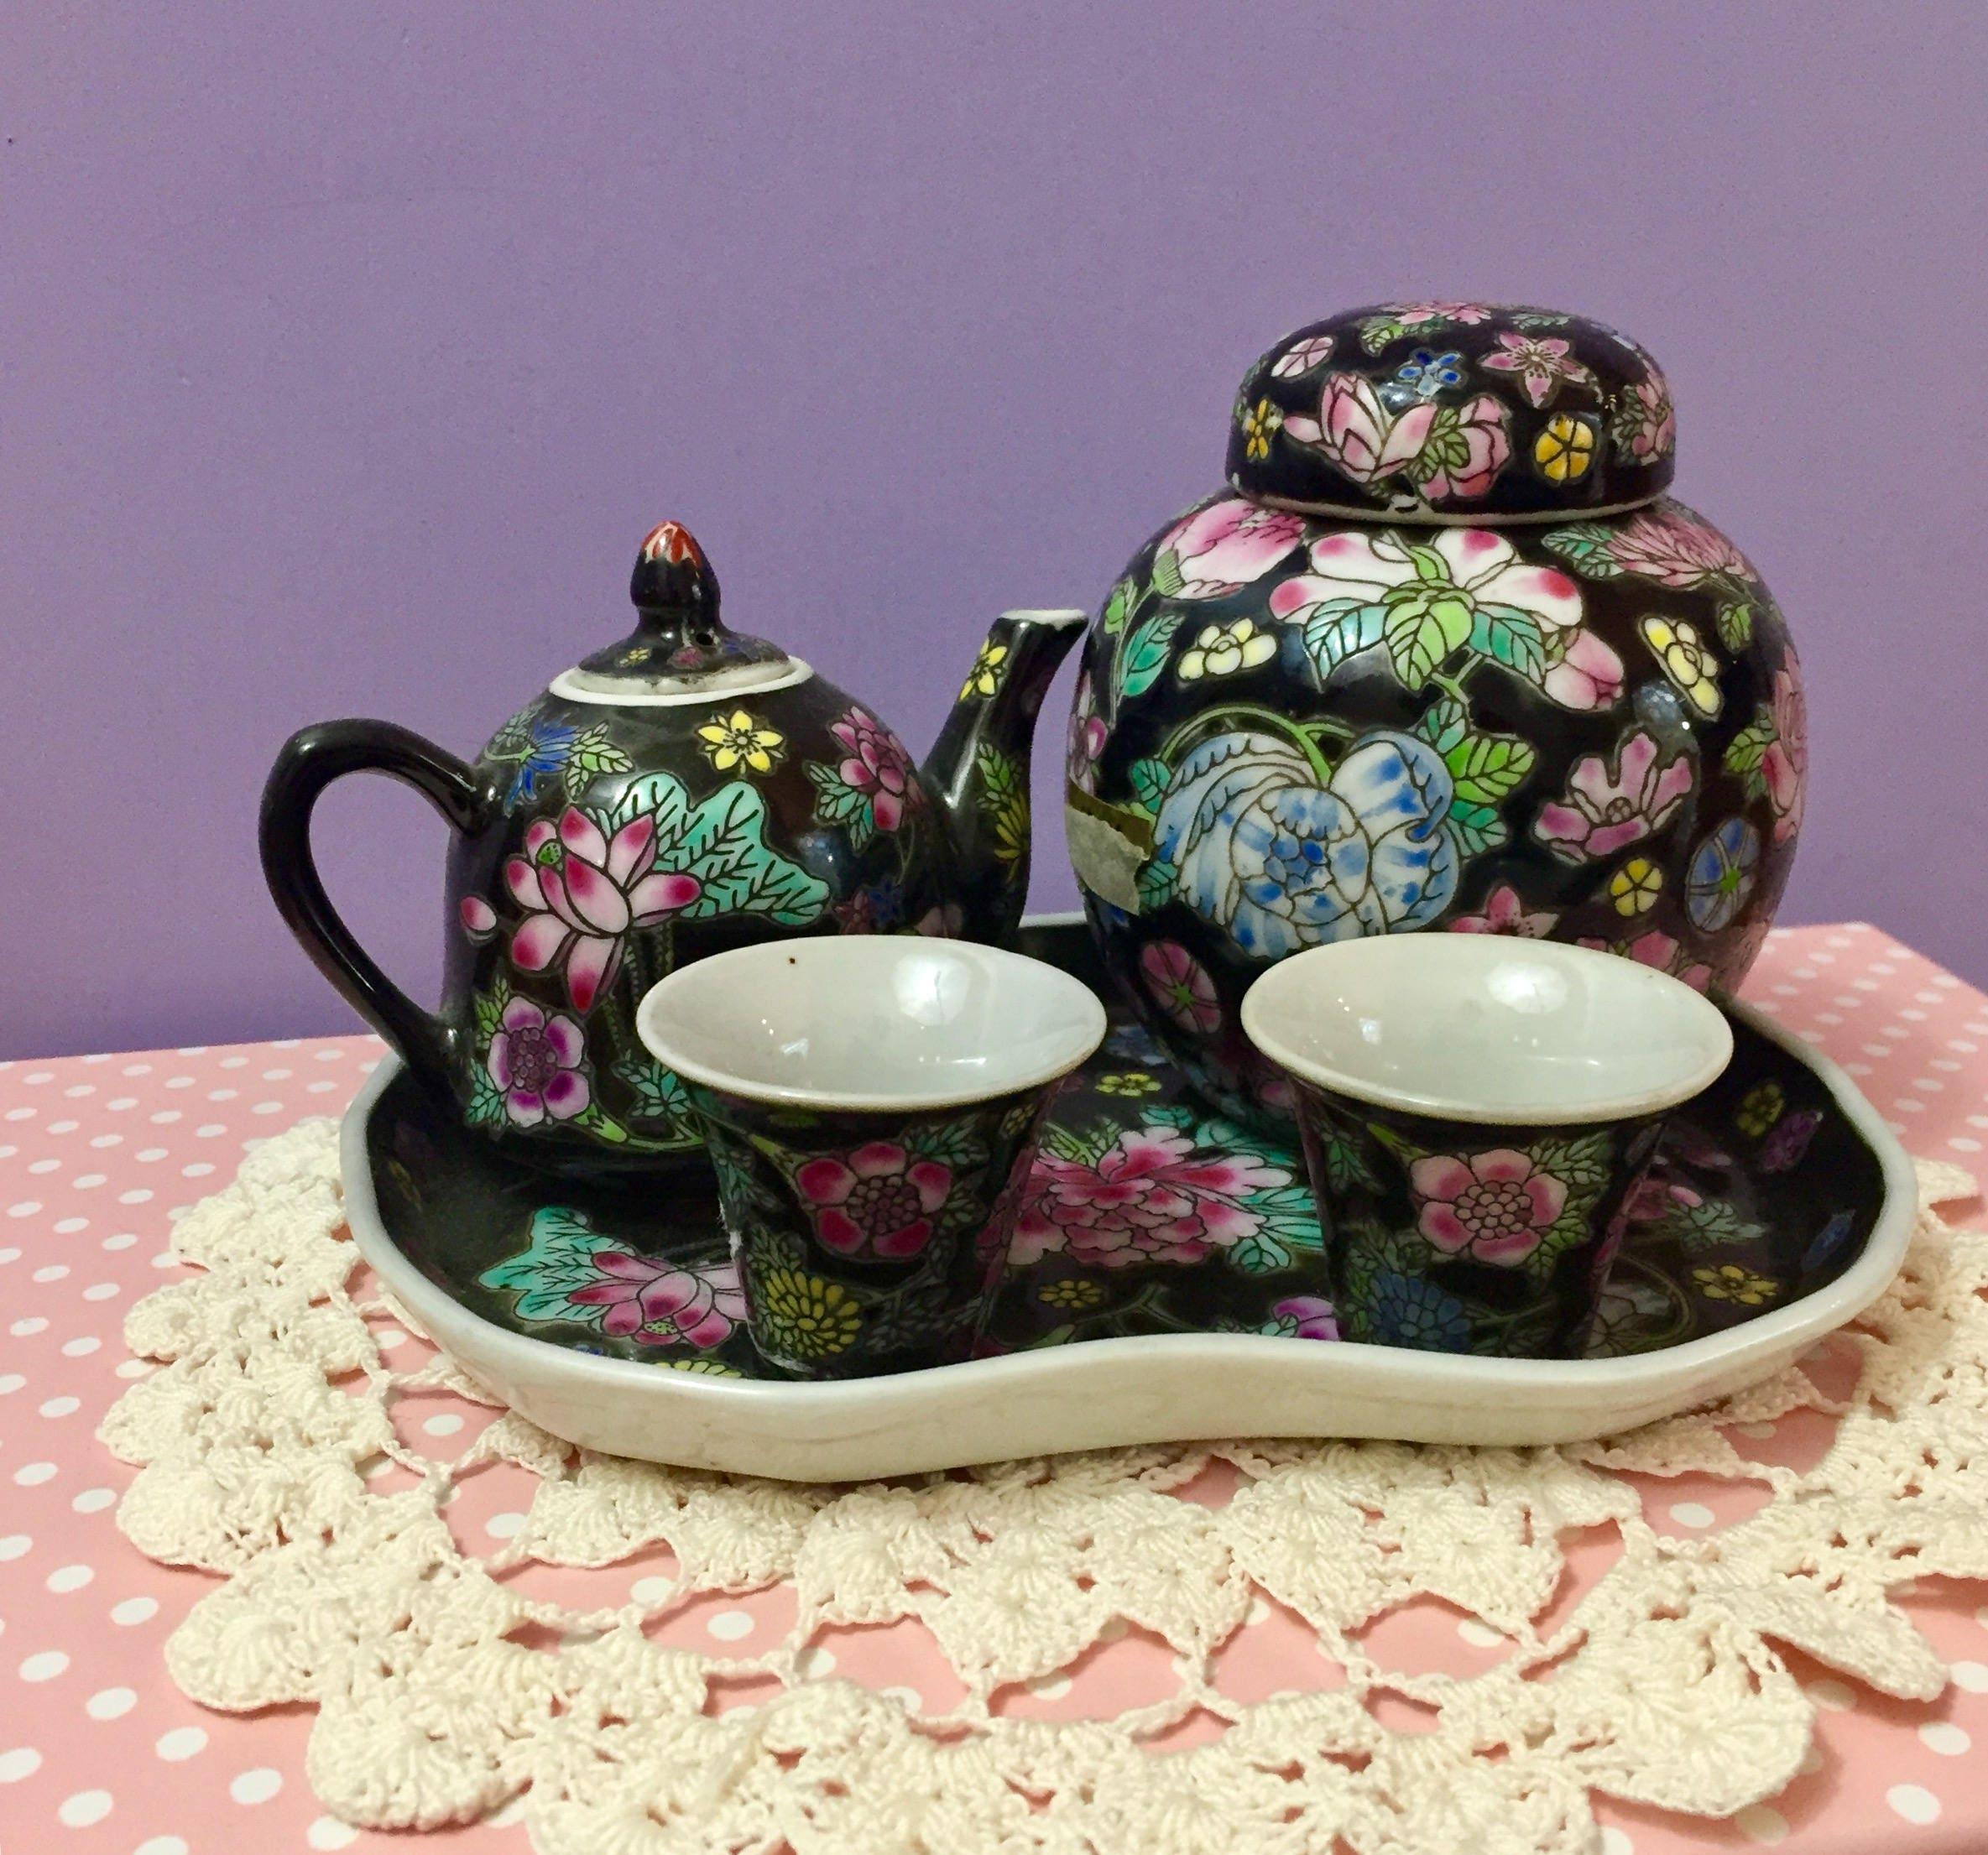 Kitchen Tea Accessories: Vintage Chinese Black Floral Children's Tea Set, Chinese